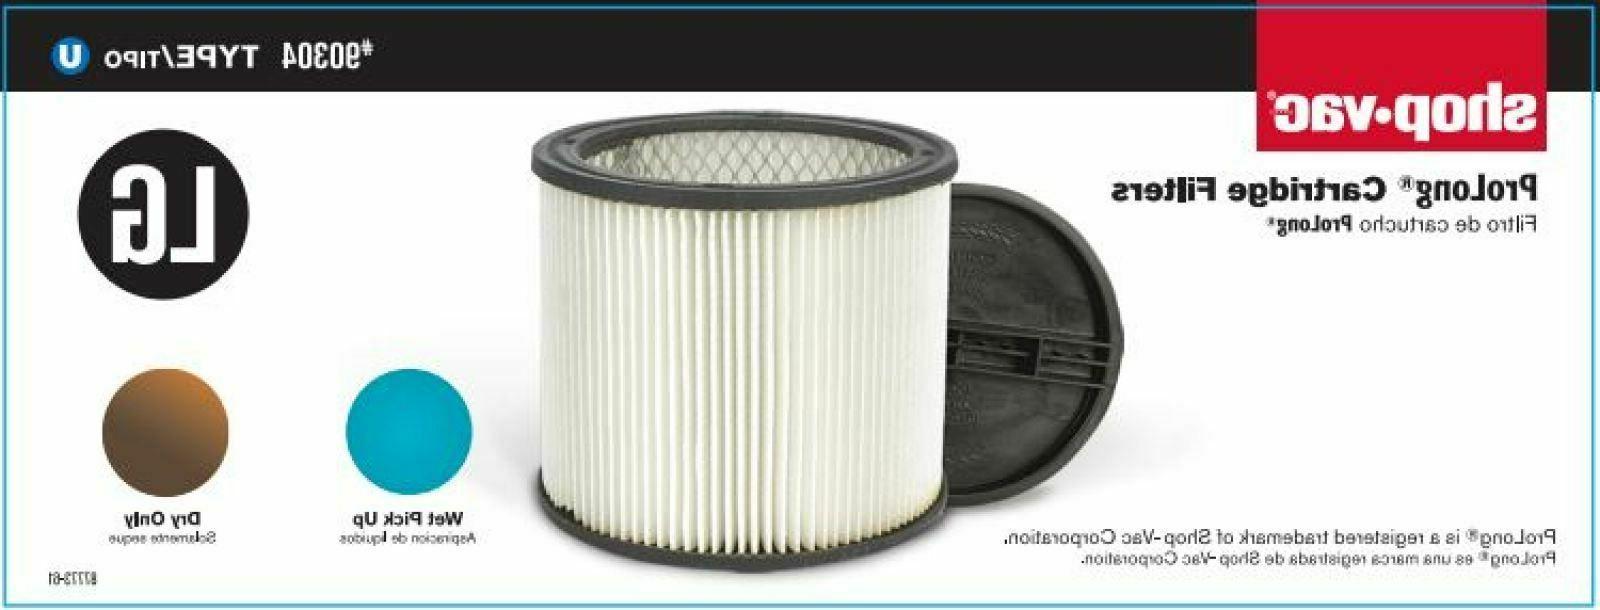 Shop-Vac Type Large Cartridge Filter Home Improvement